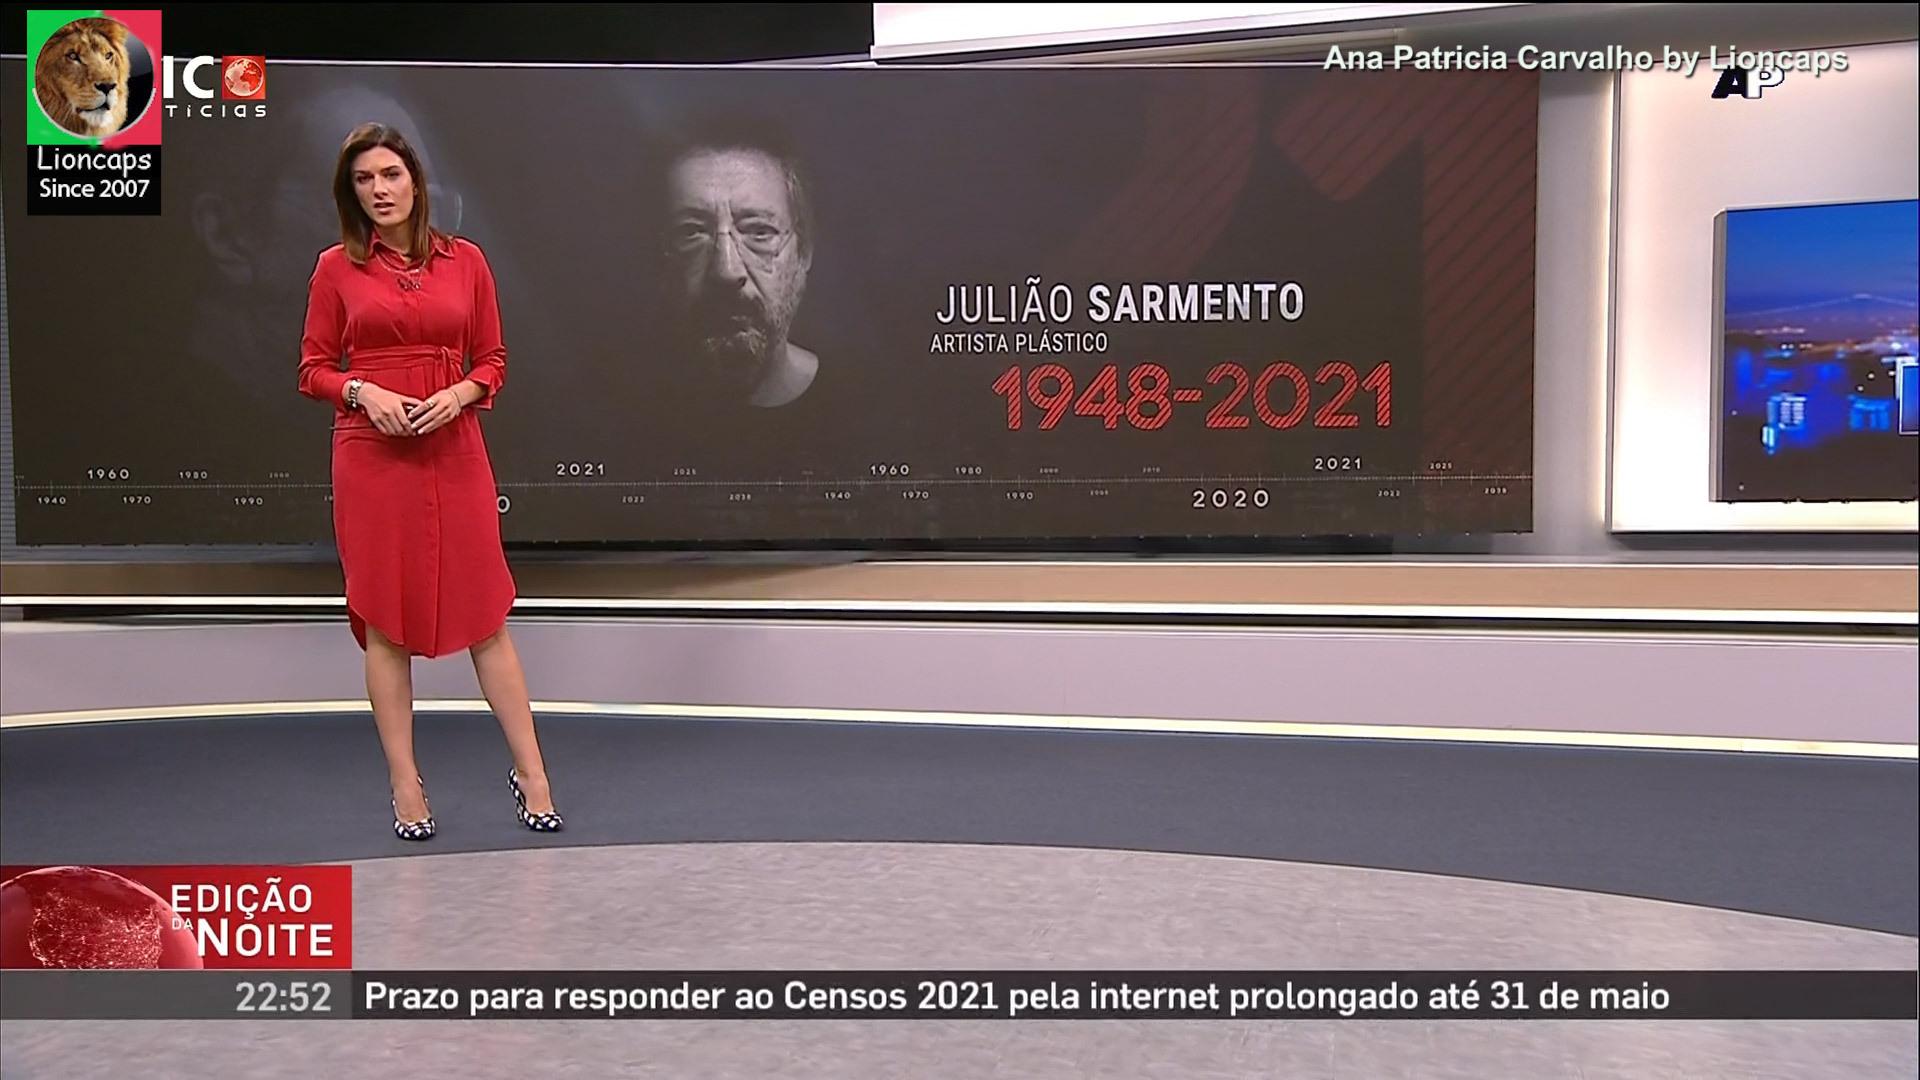 ana_patricia_carvalho_sicn_lioncaps_30_05_2021 (11).jpg